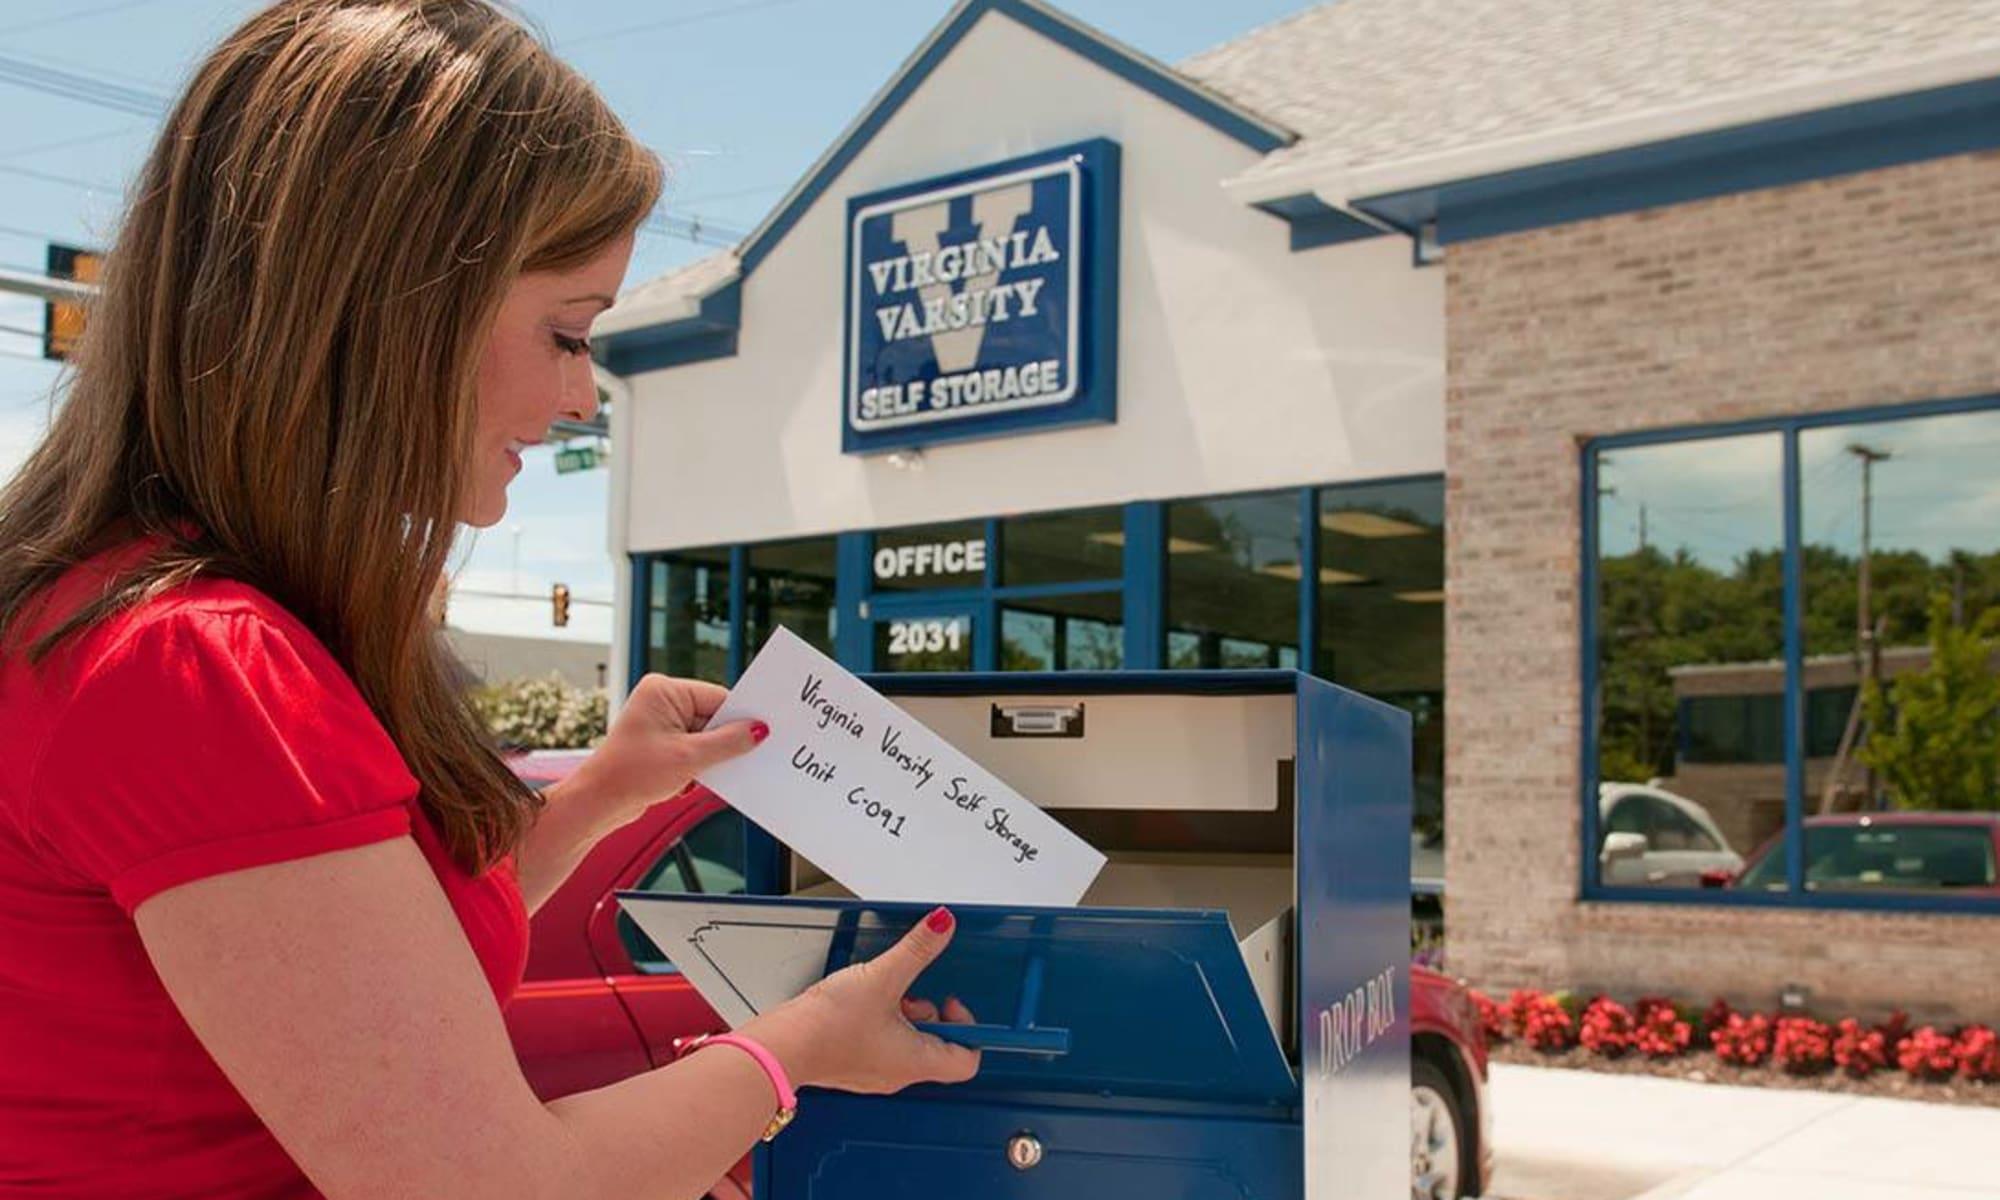 Contact-free payments made at a drop-box at Virginia Varsity Storage in Salem, Virginia